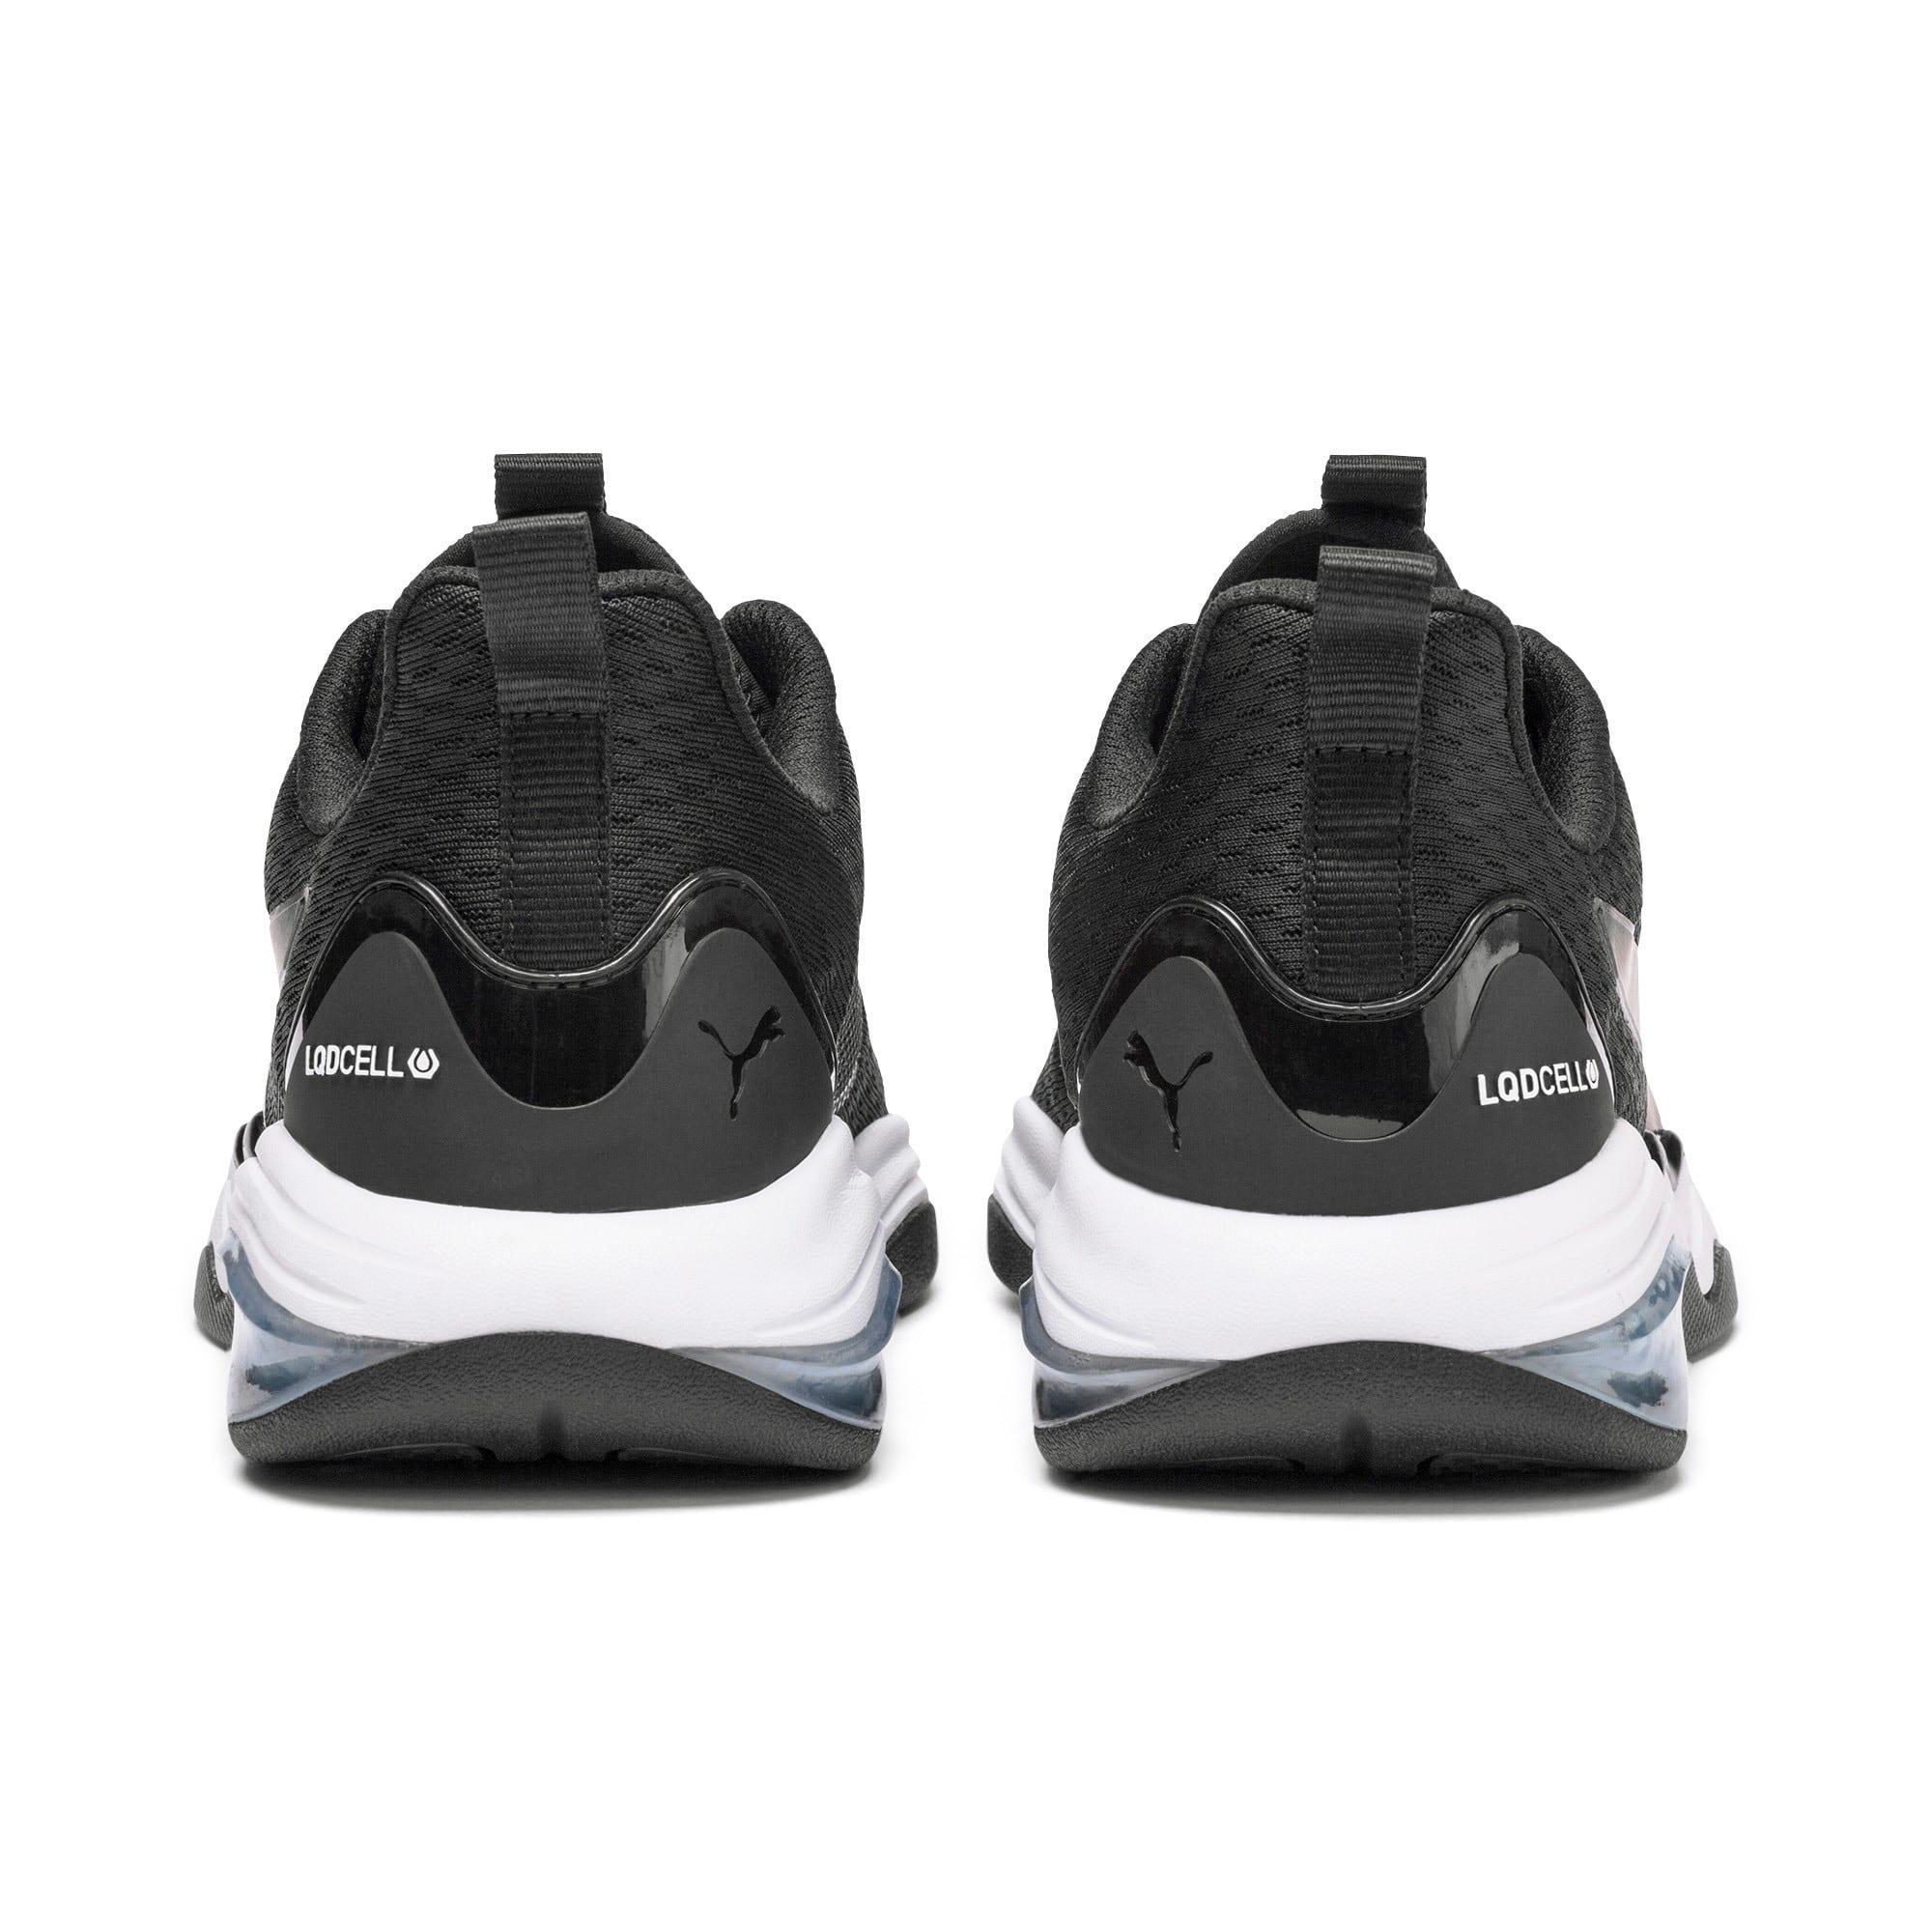 Thumbnail 5 of LQDCELL Tension Men's Training Shoes, Puma Black-Puma White, medium-IND